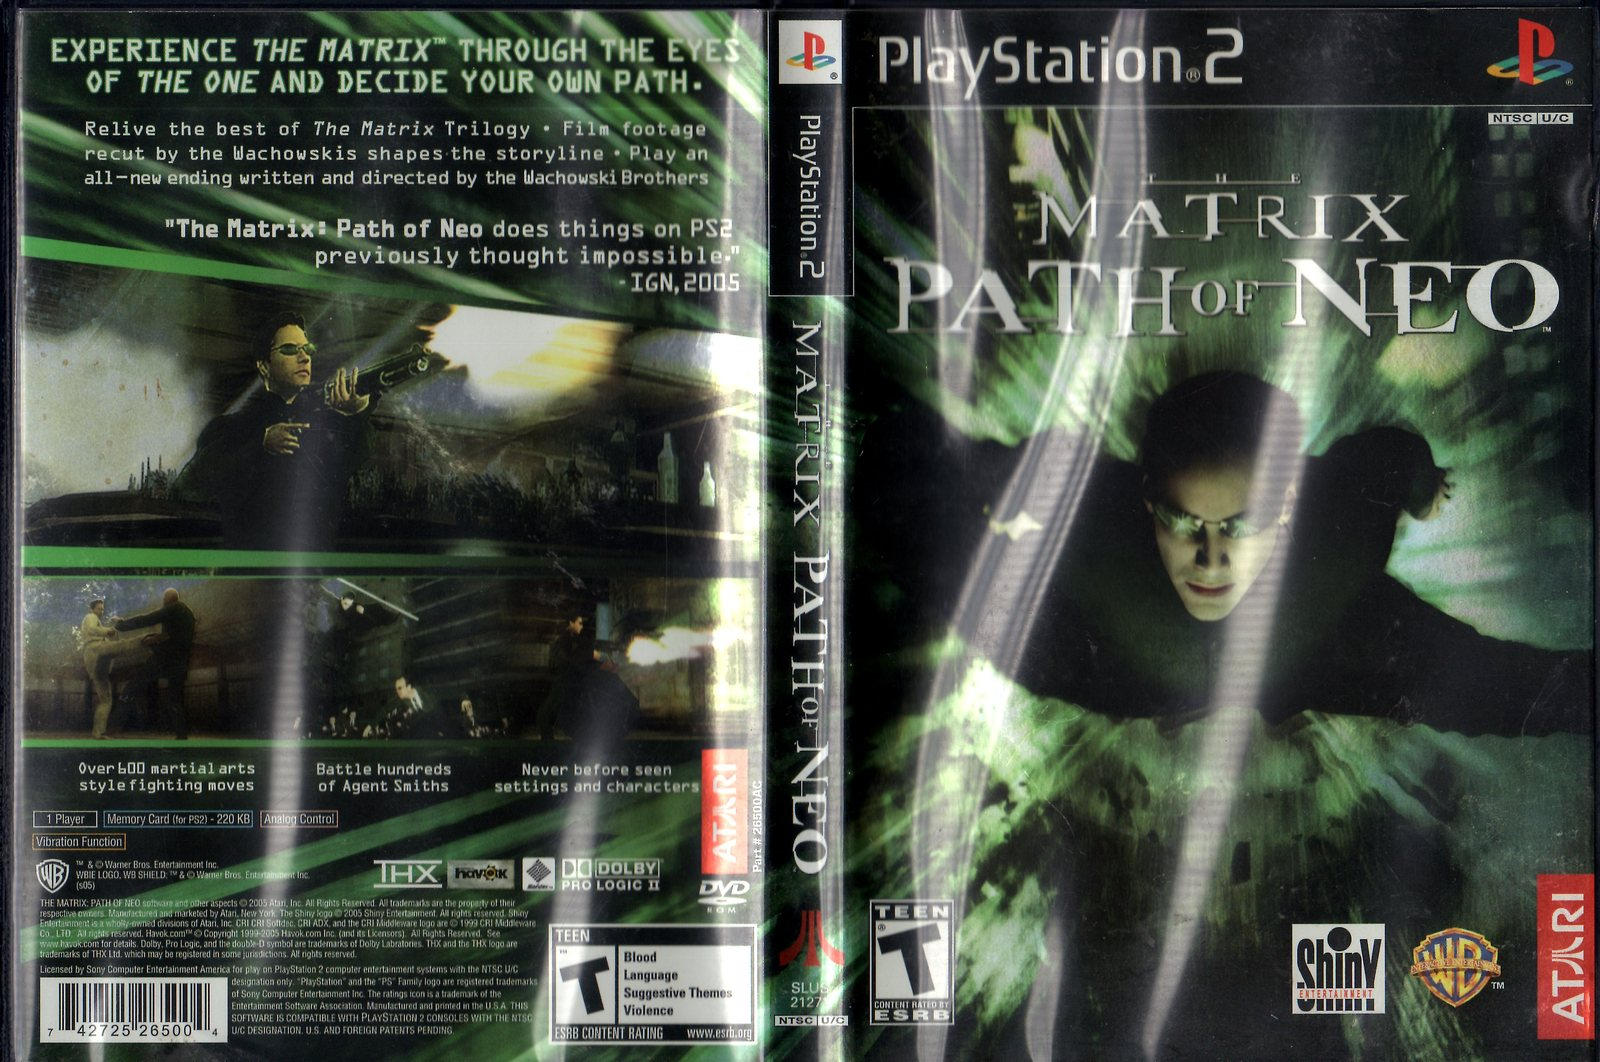 PlayStation 2 : Matrix Path of Neo